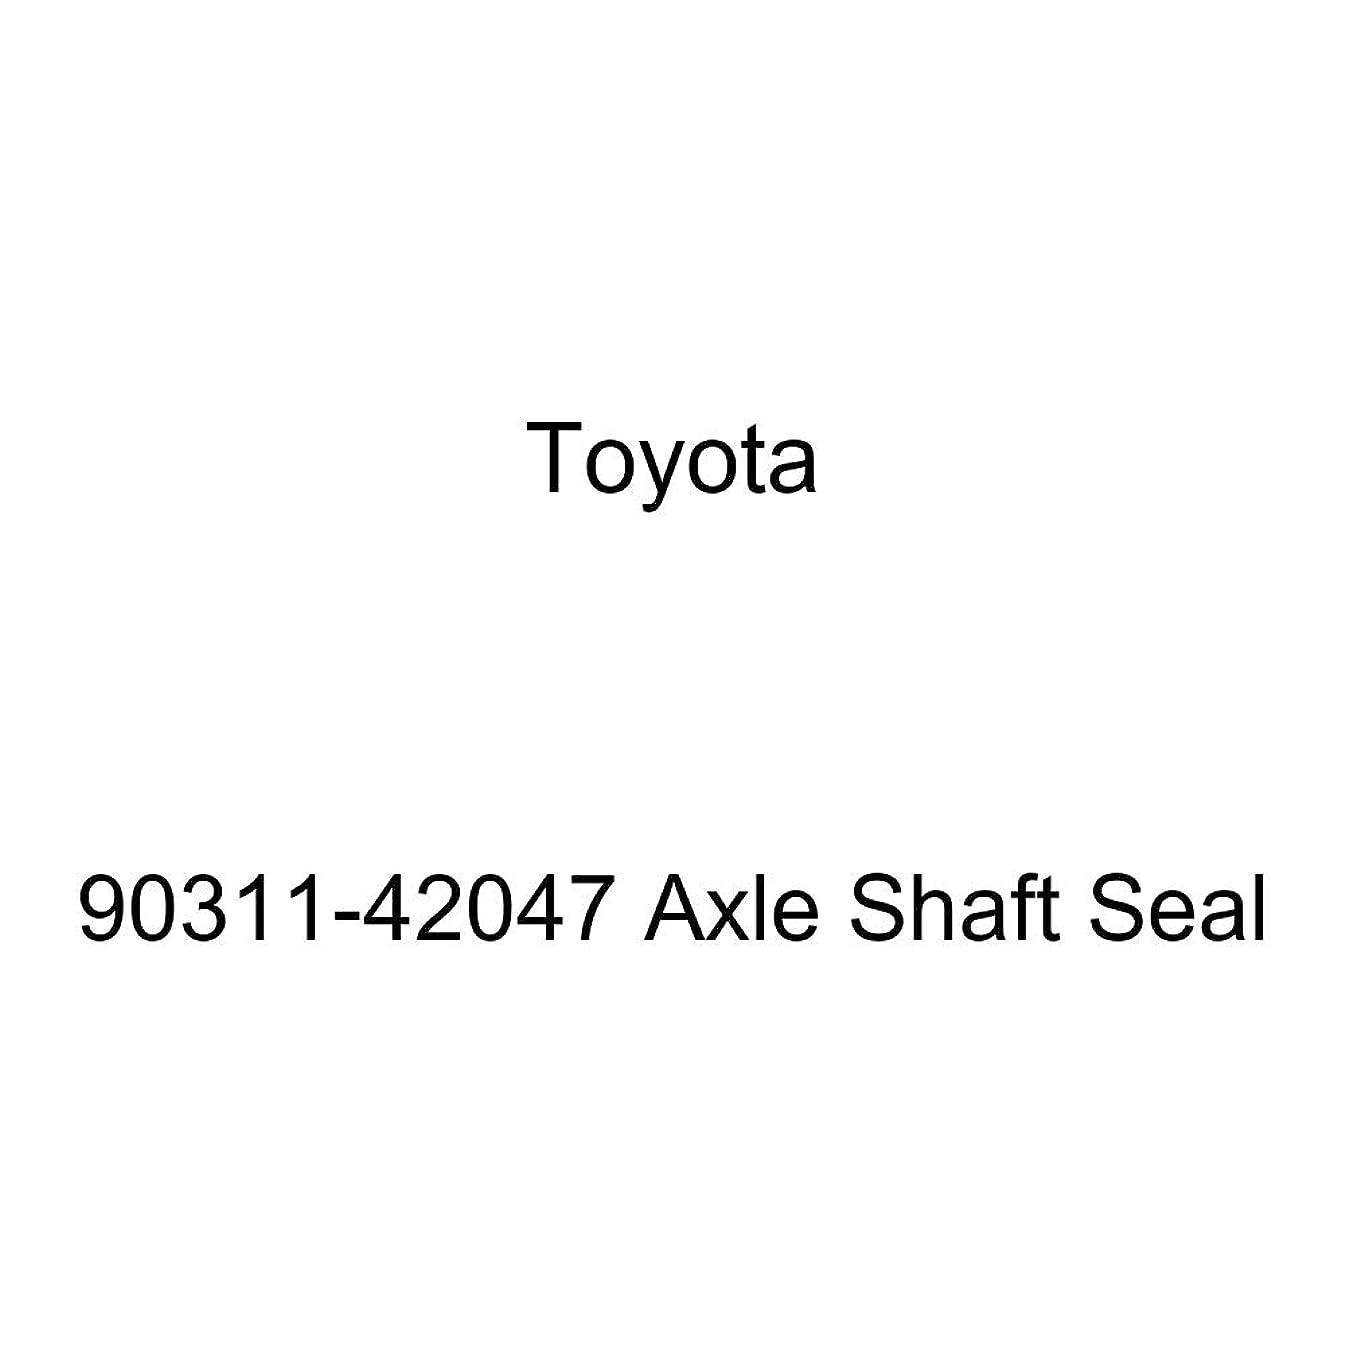 Toyota 90311-42047 Axle Shaft Seal